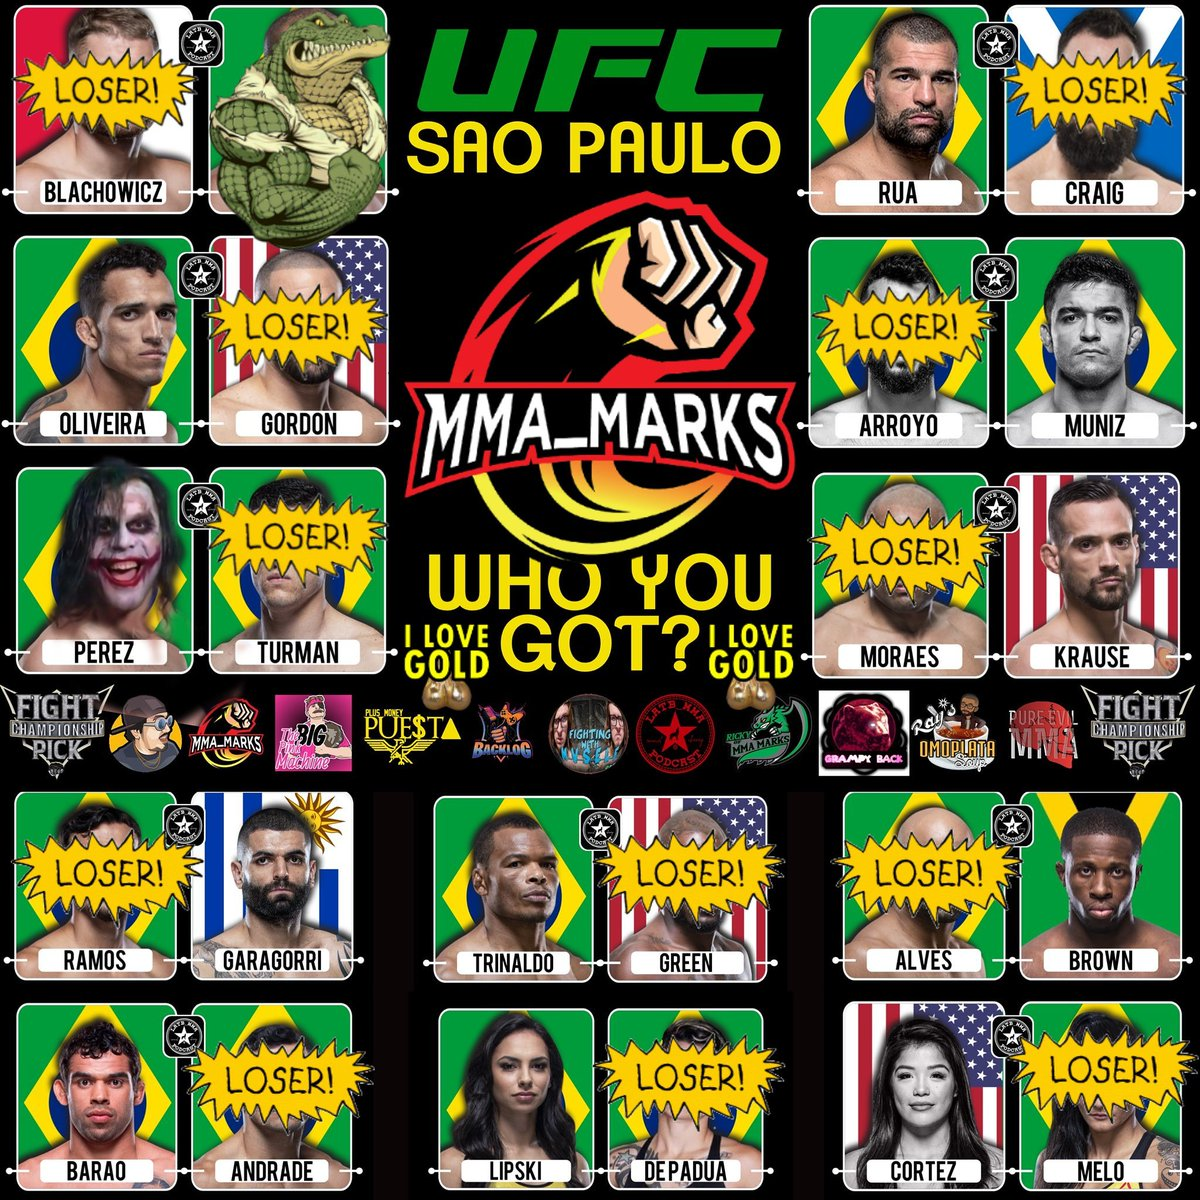 My fight picks #UFCSaoPaulo